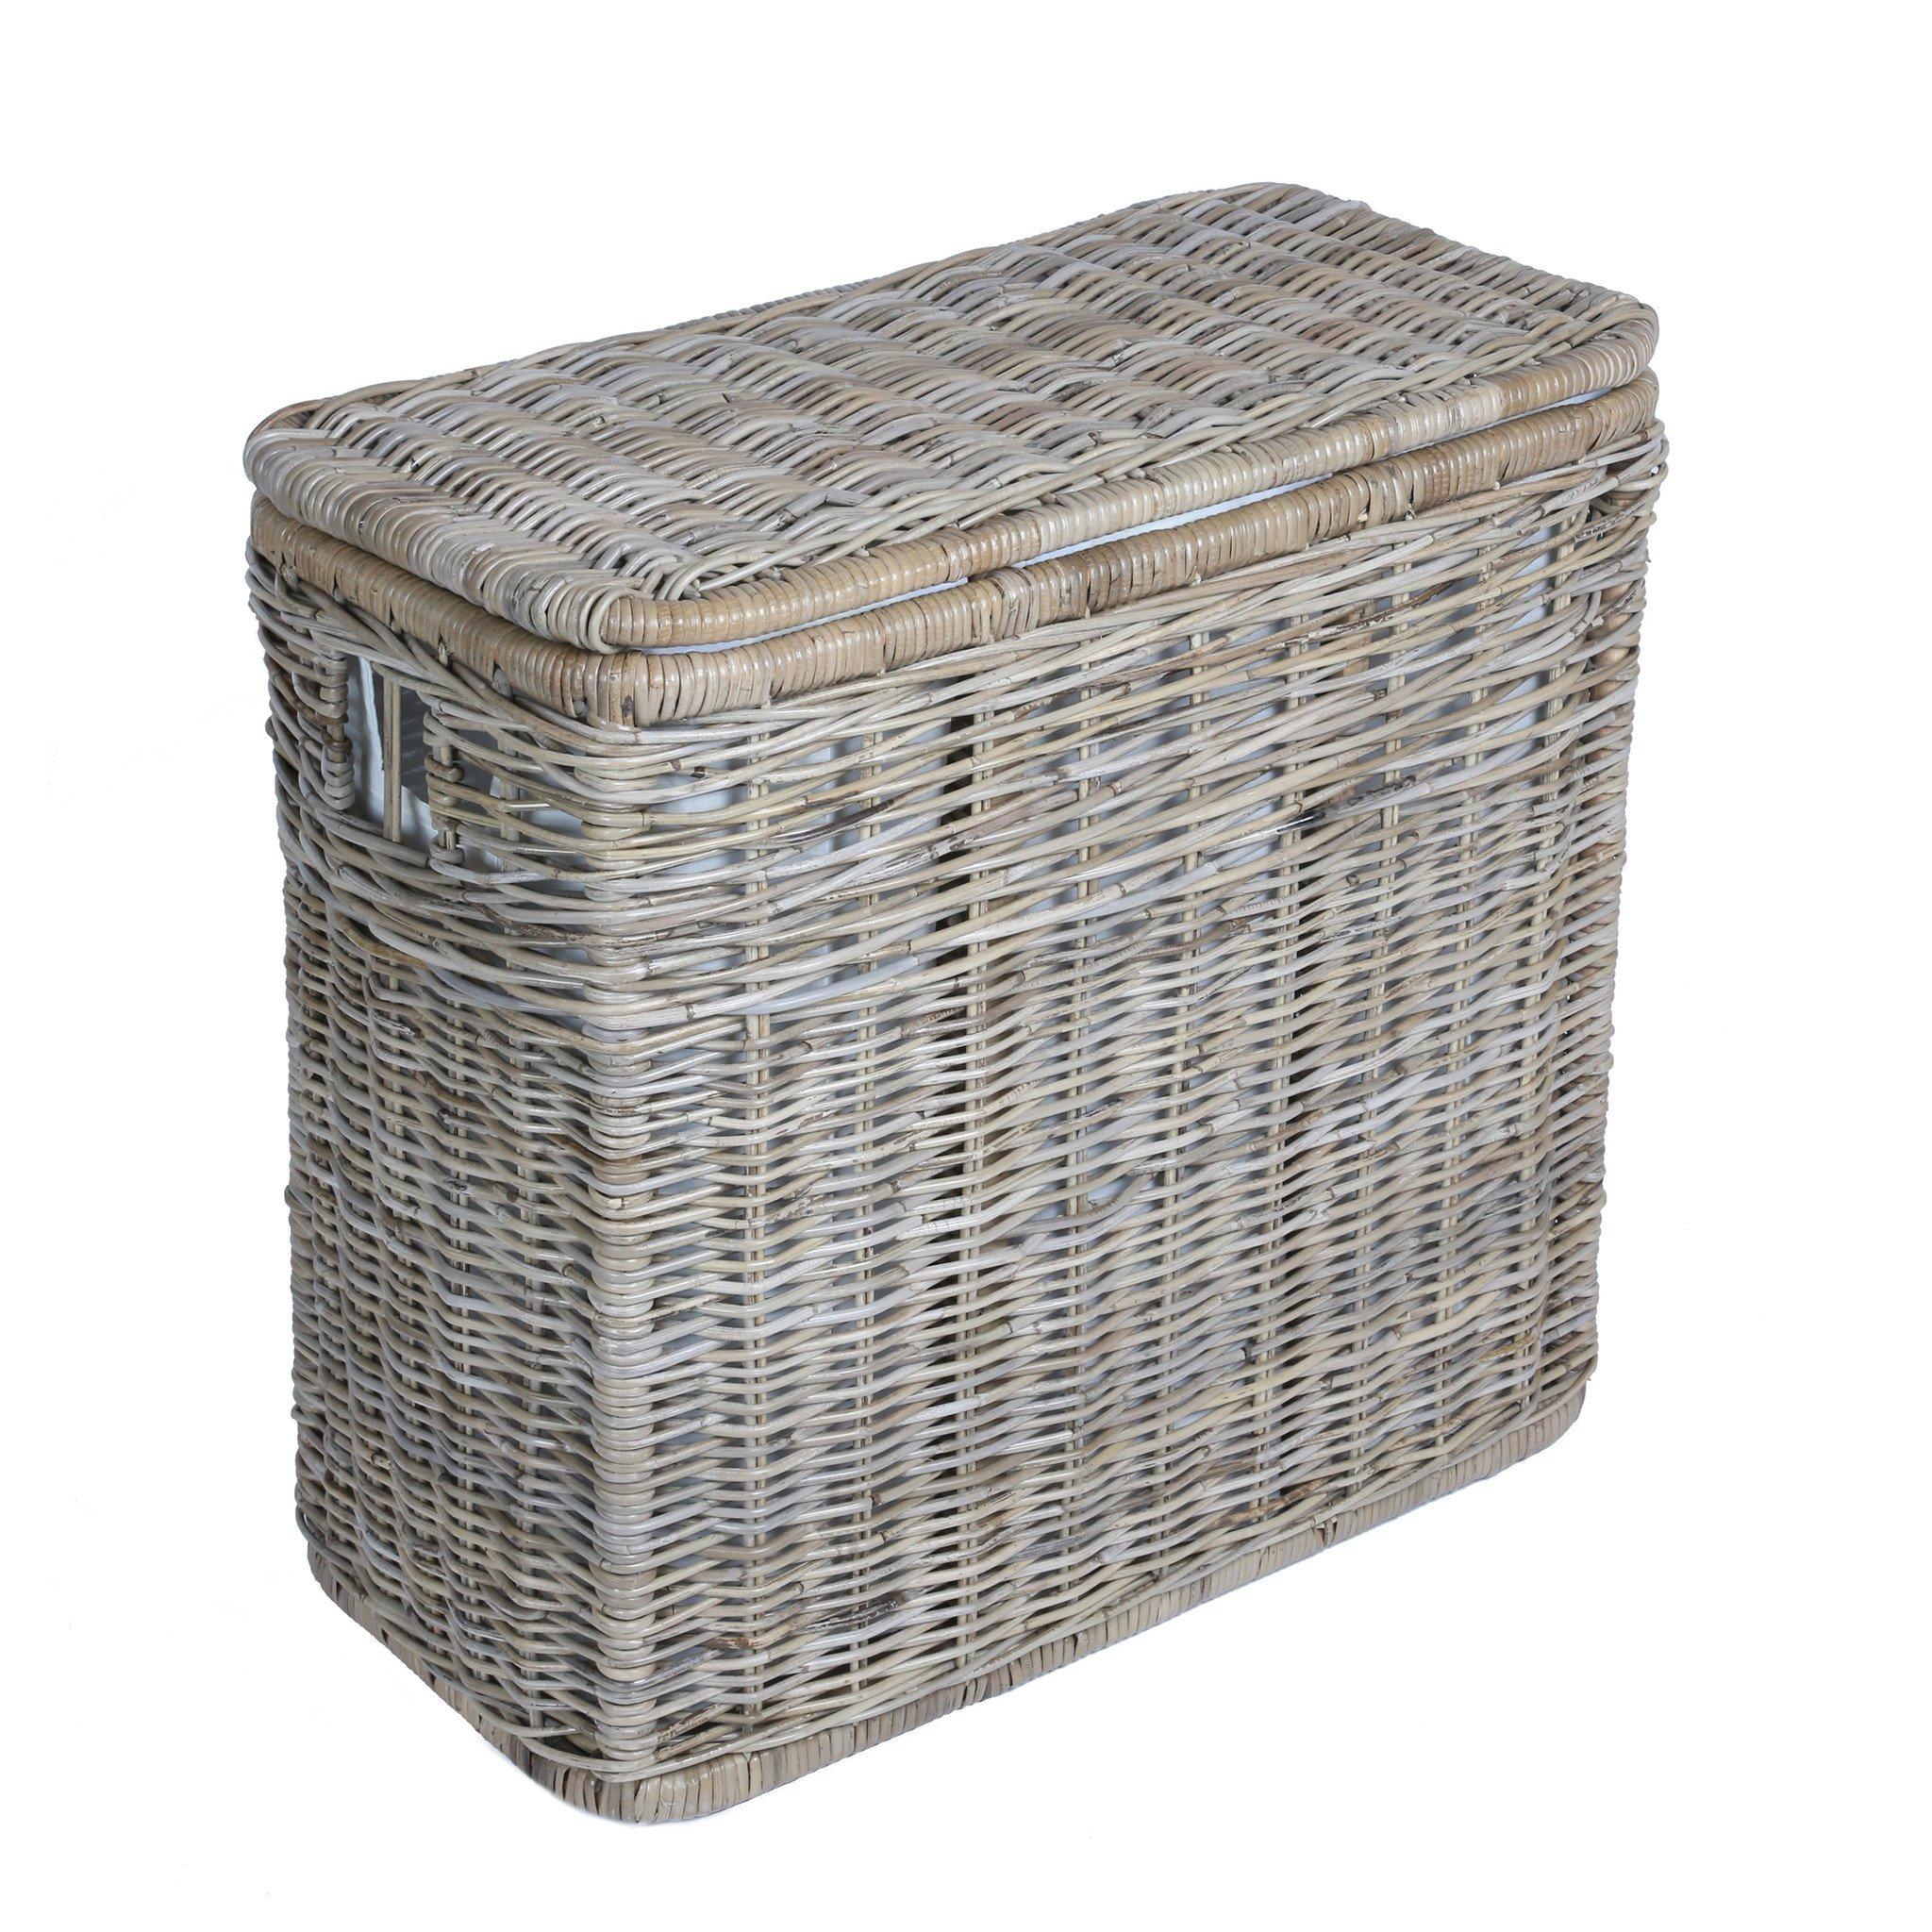 wicker laundry basket ... 3-compartment kubu wicker laundry hamper in serene grey | the basket NTFECMS